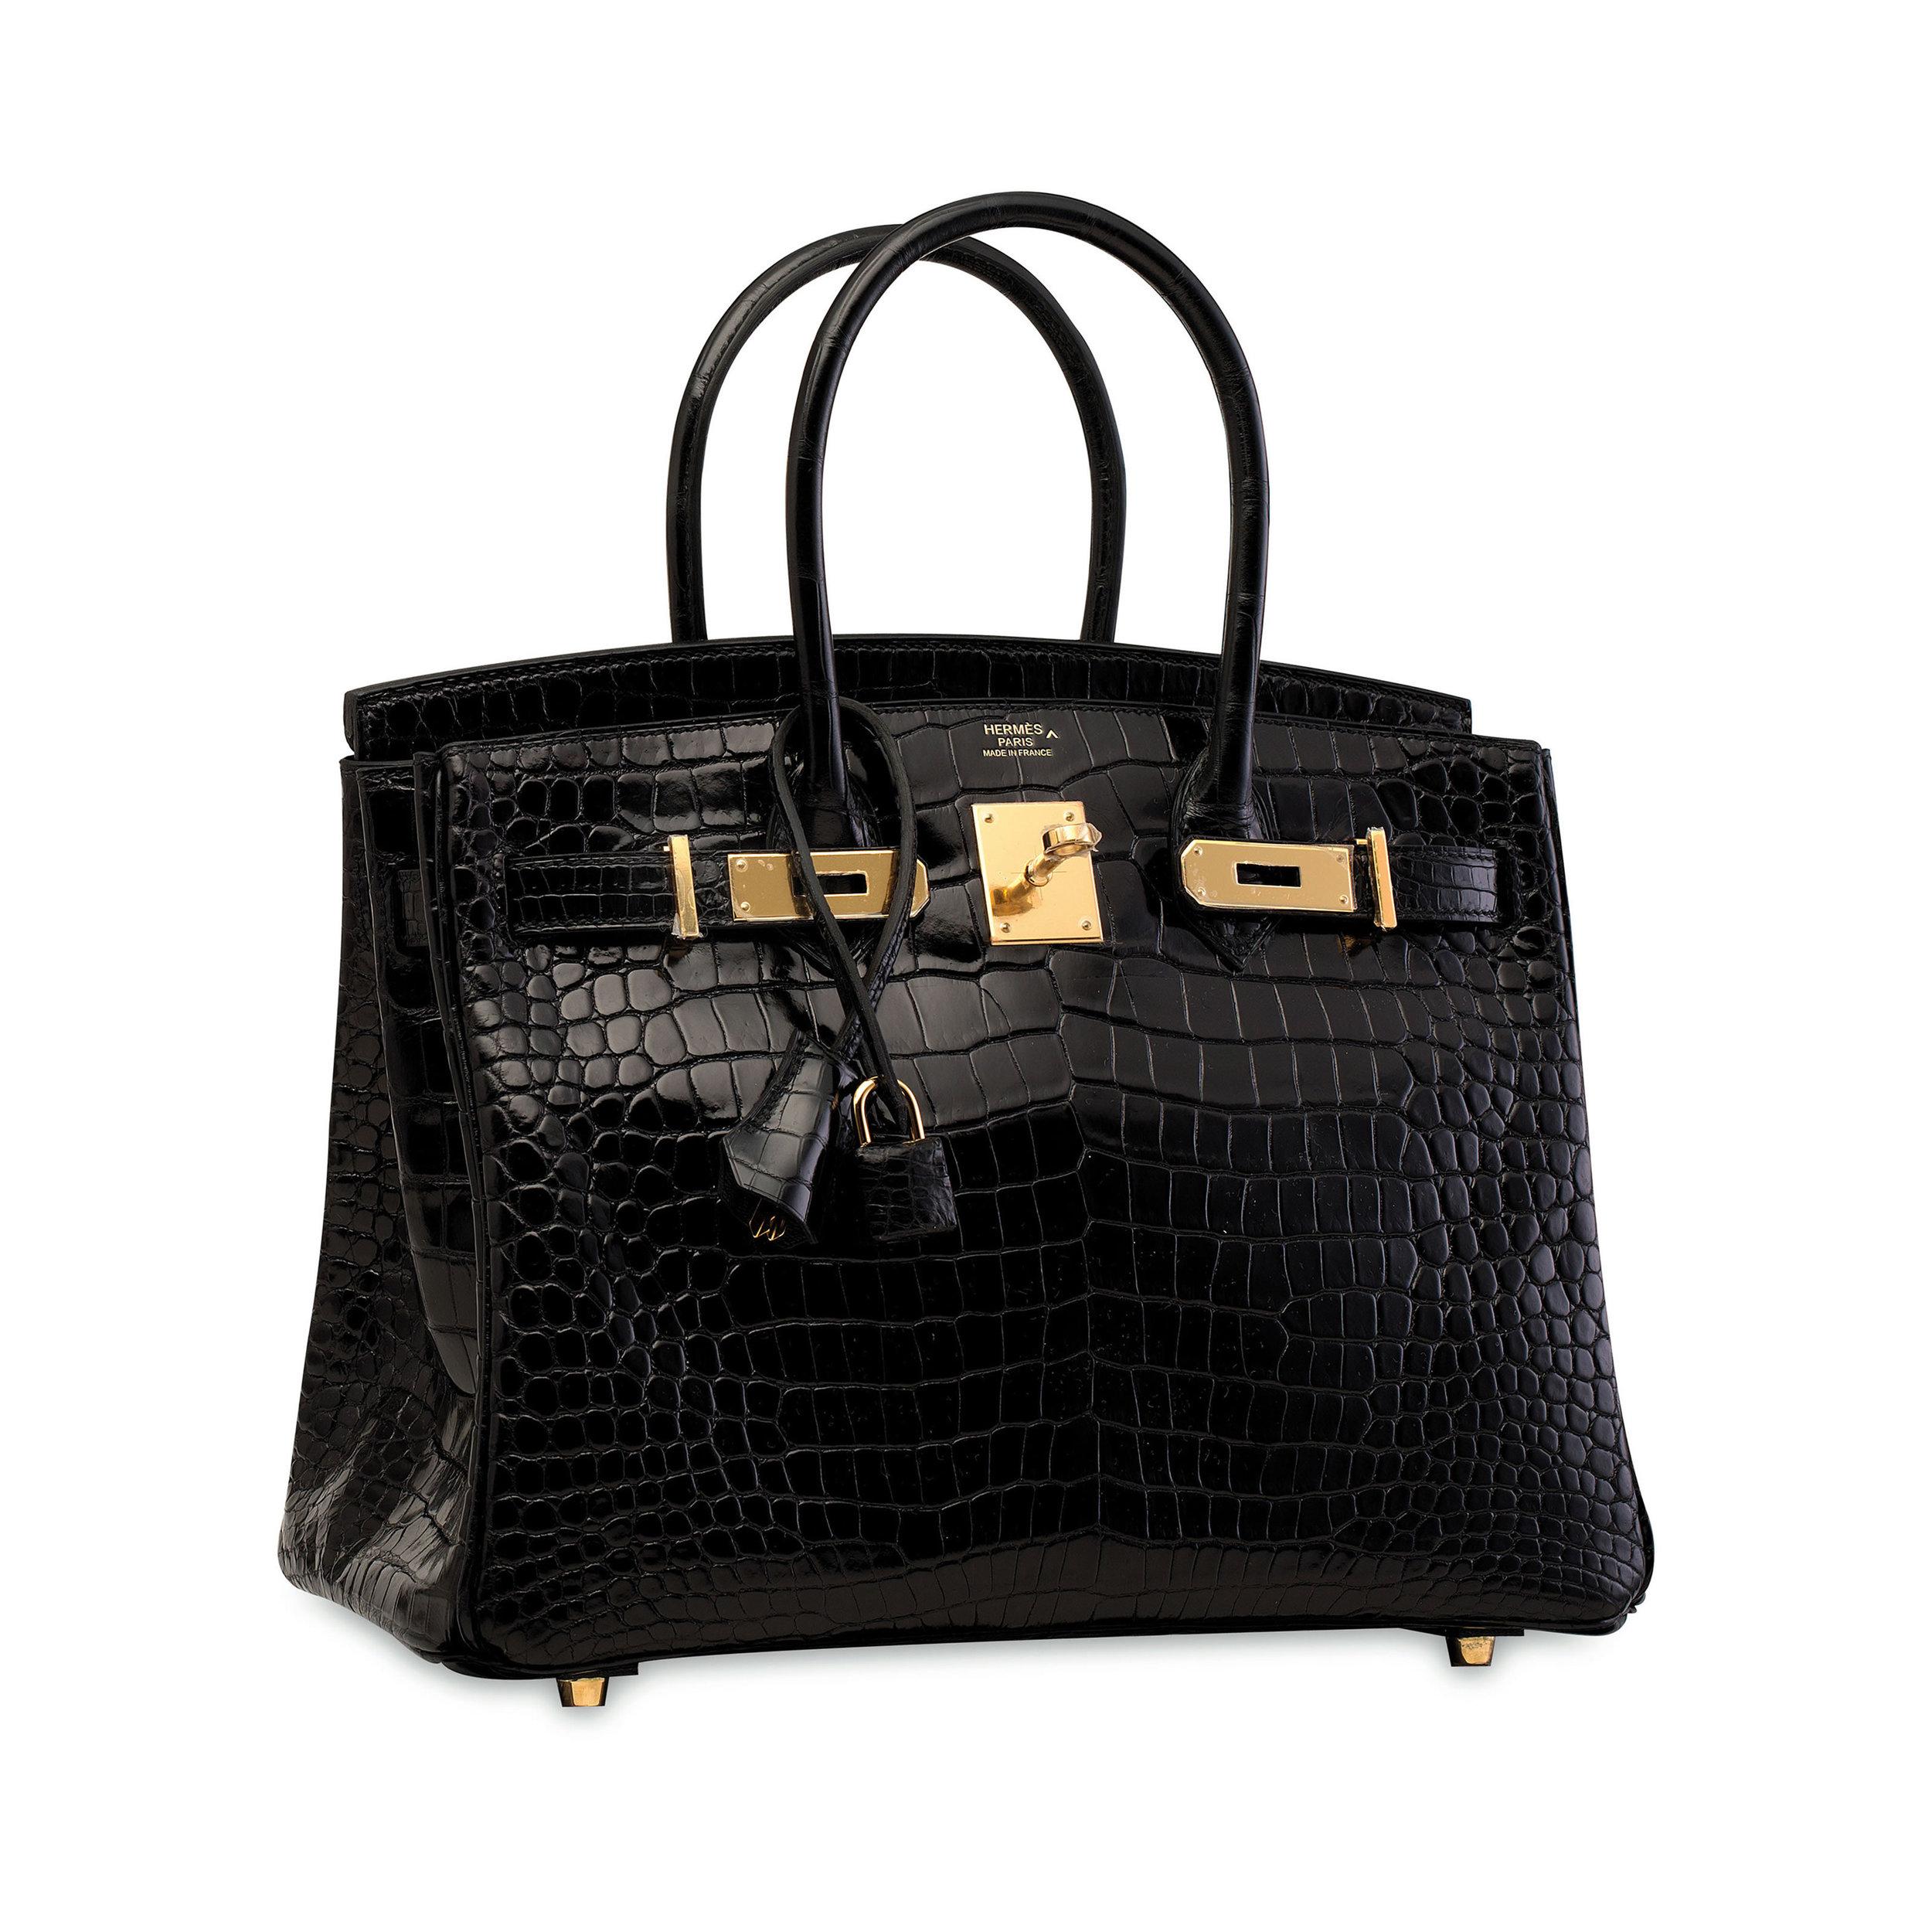 Hermès Shiny Black Porosus Birkin